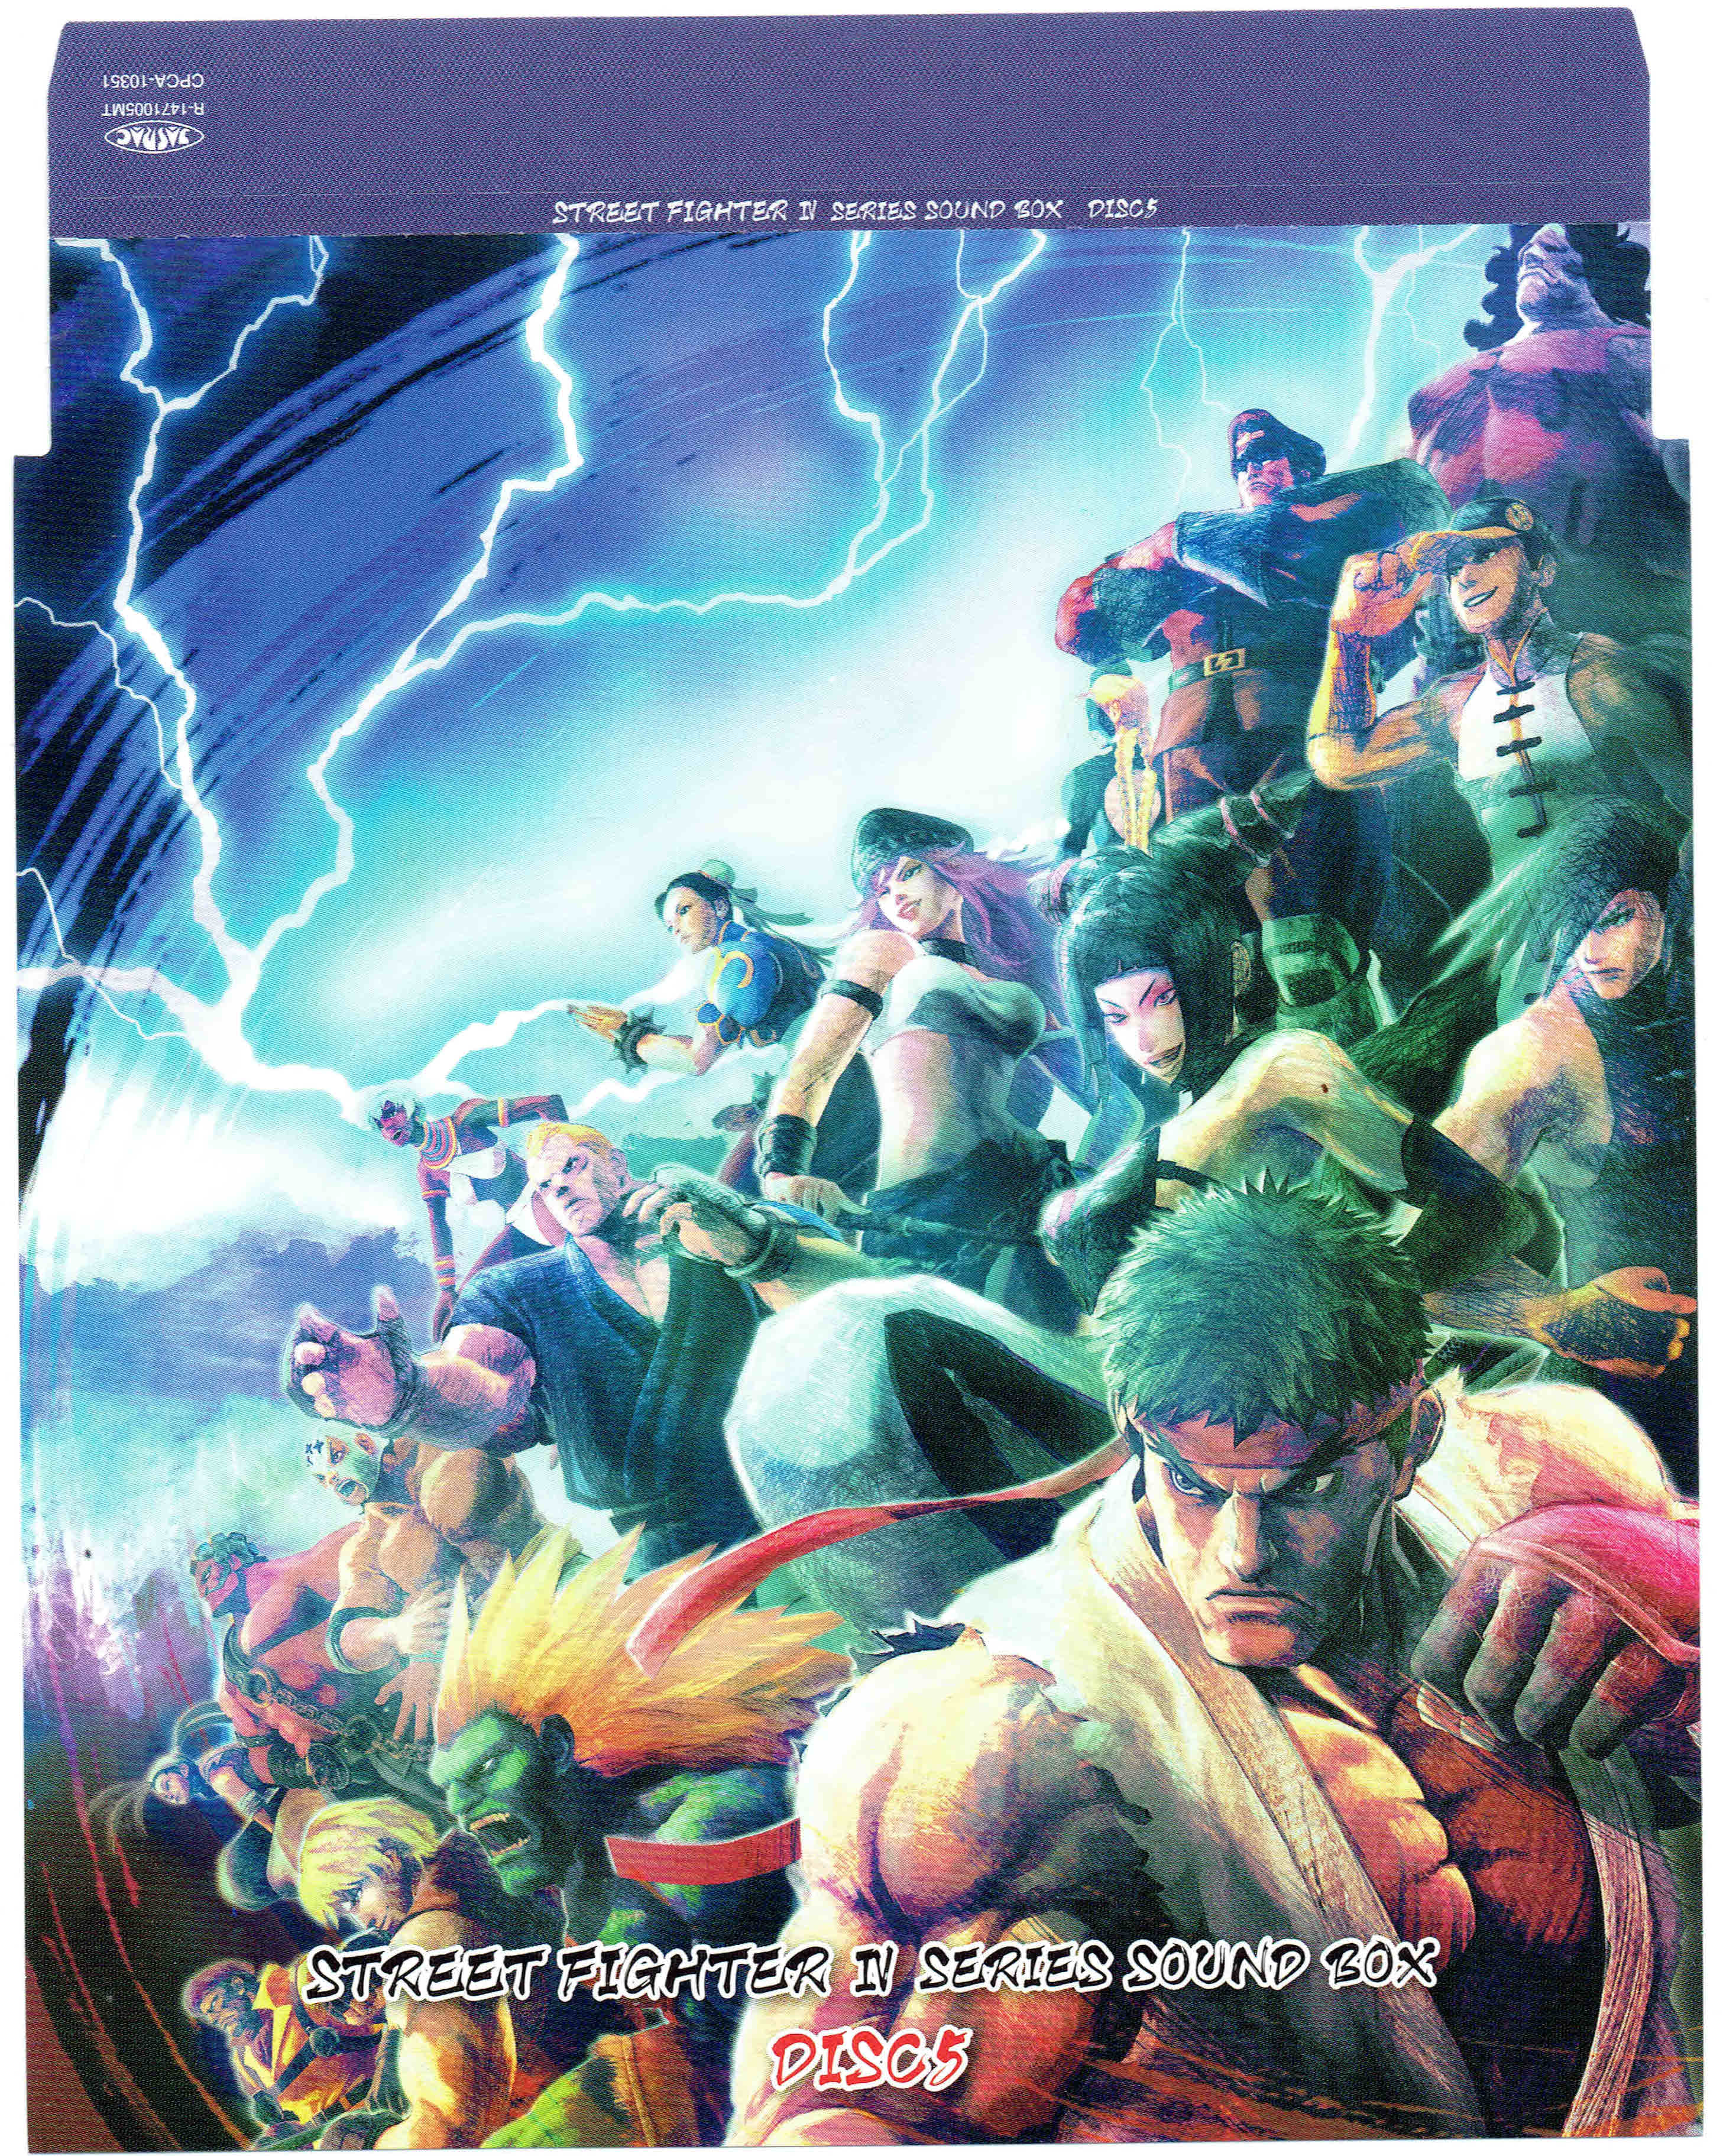 VGMO -Video Game Music Online- » Street Fighter IV Series Sound Box